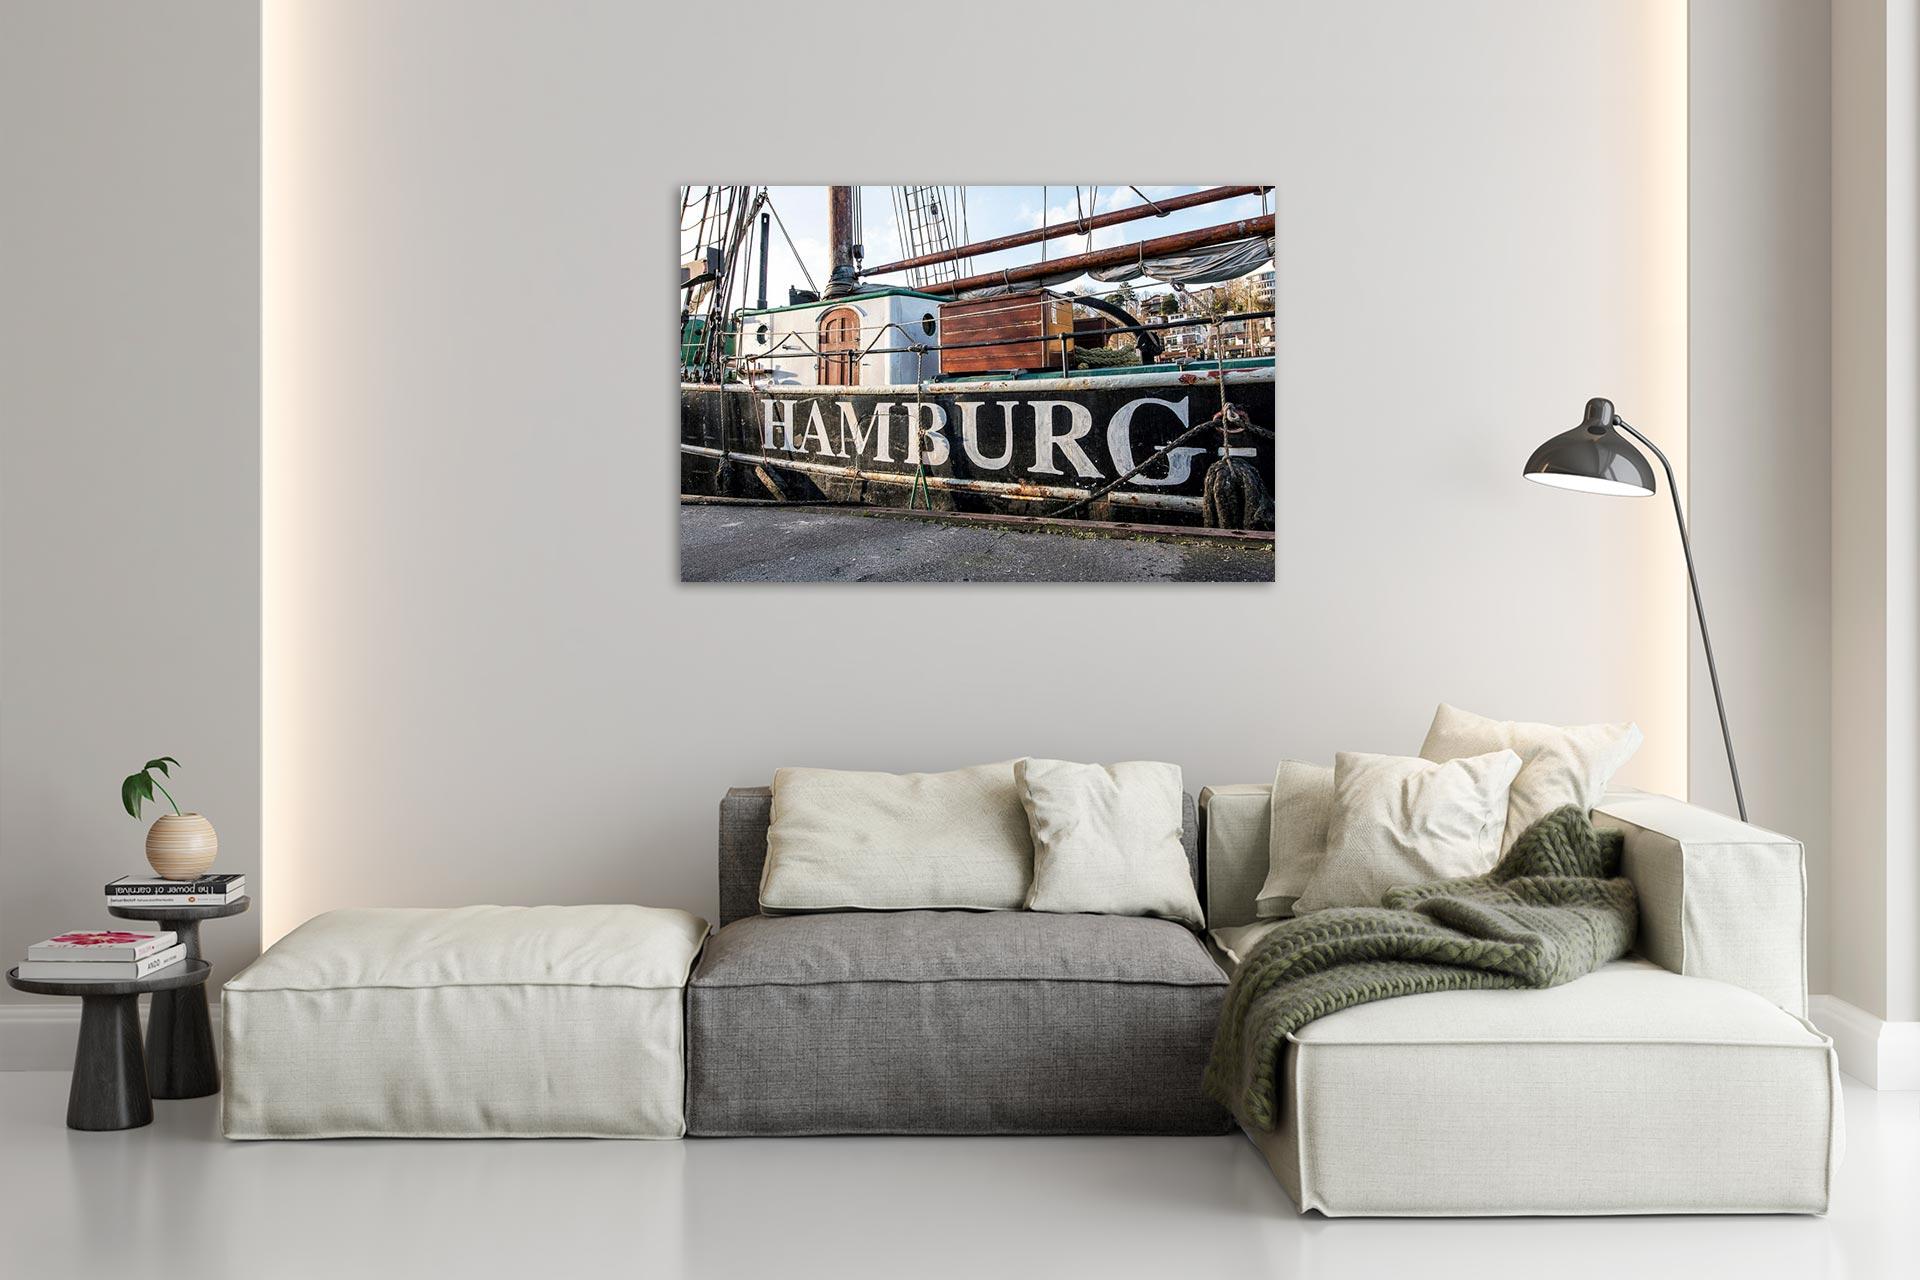 NL057-schiffswand-hamburg-wandbild-auf-leinwand-acrylglas-aludibond-wohnzimmer